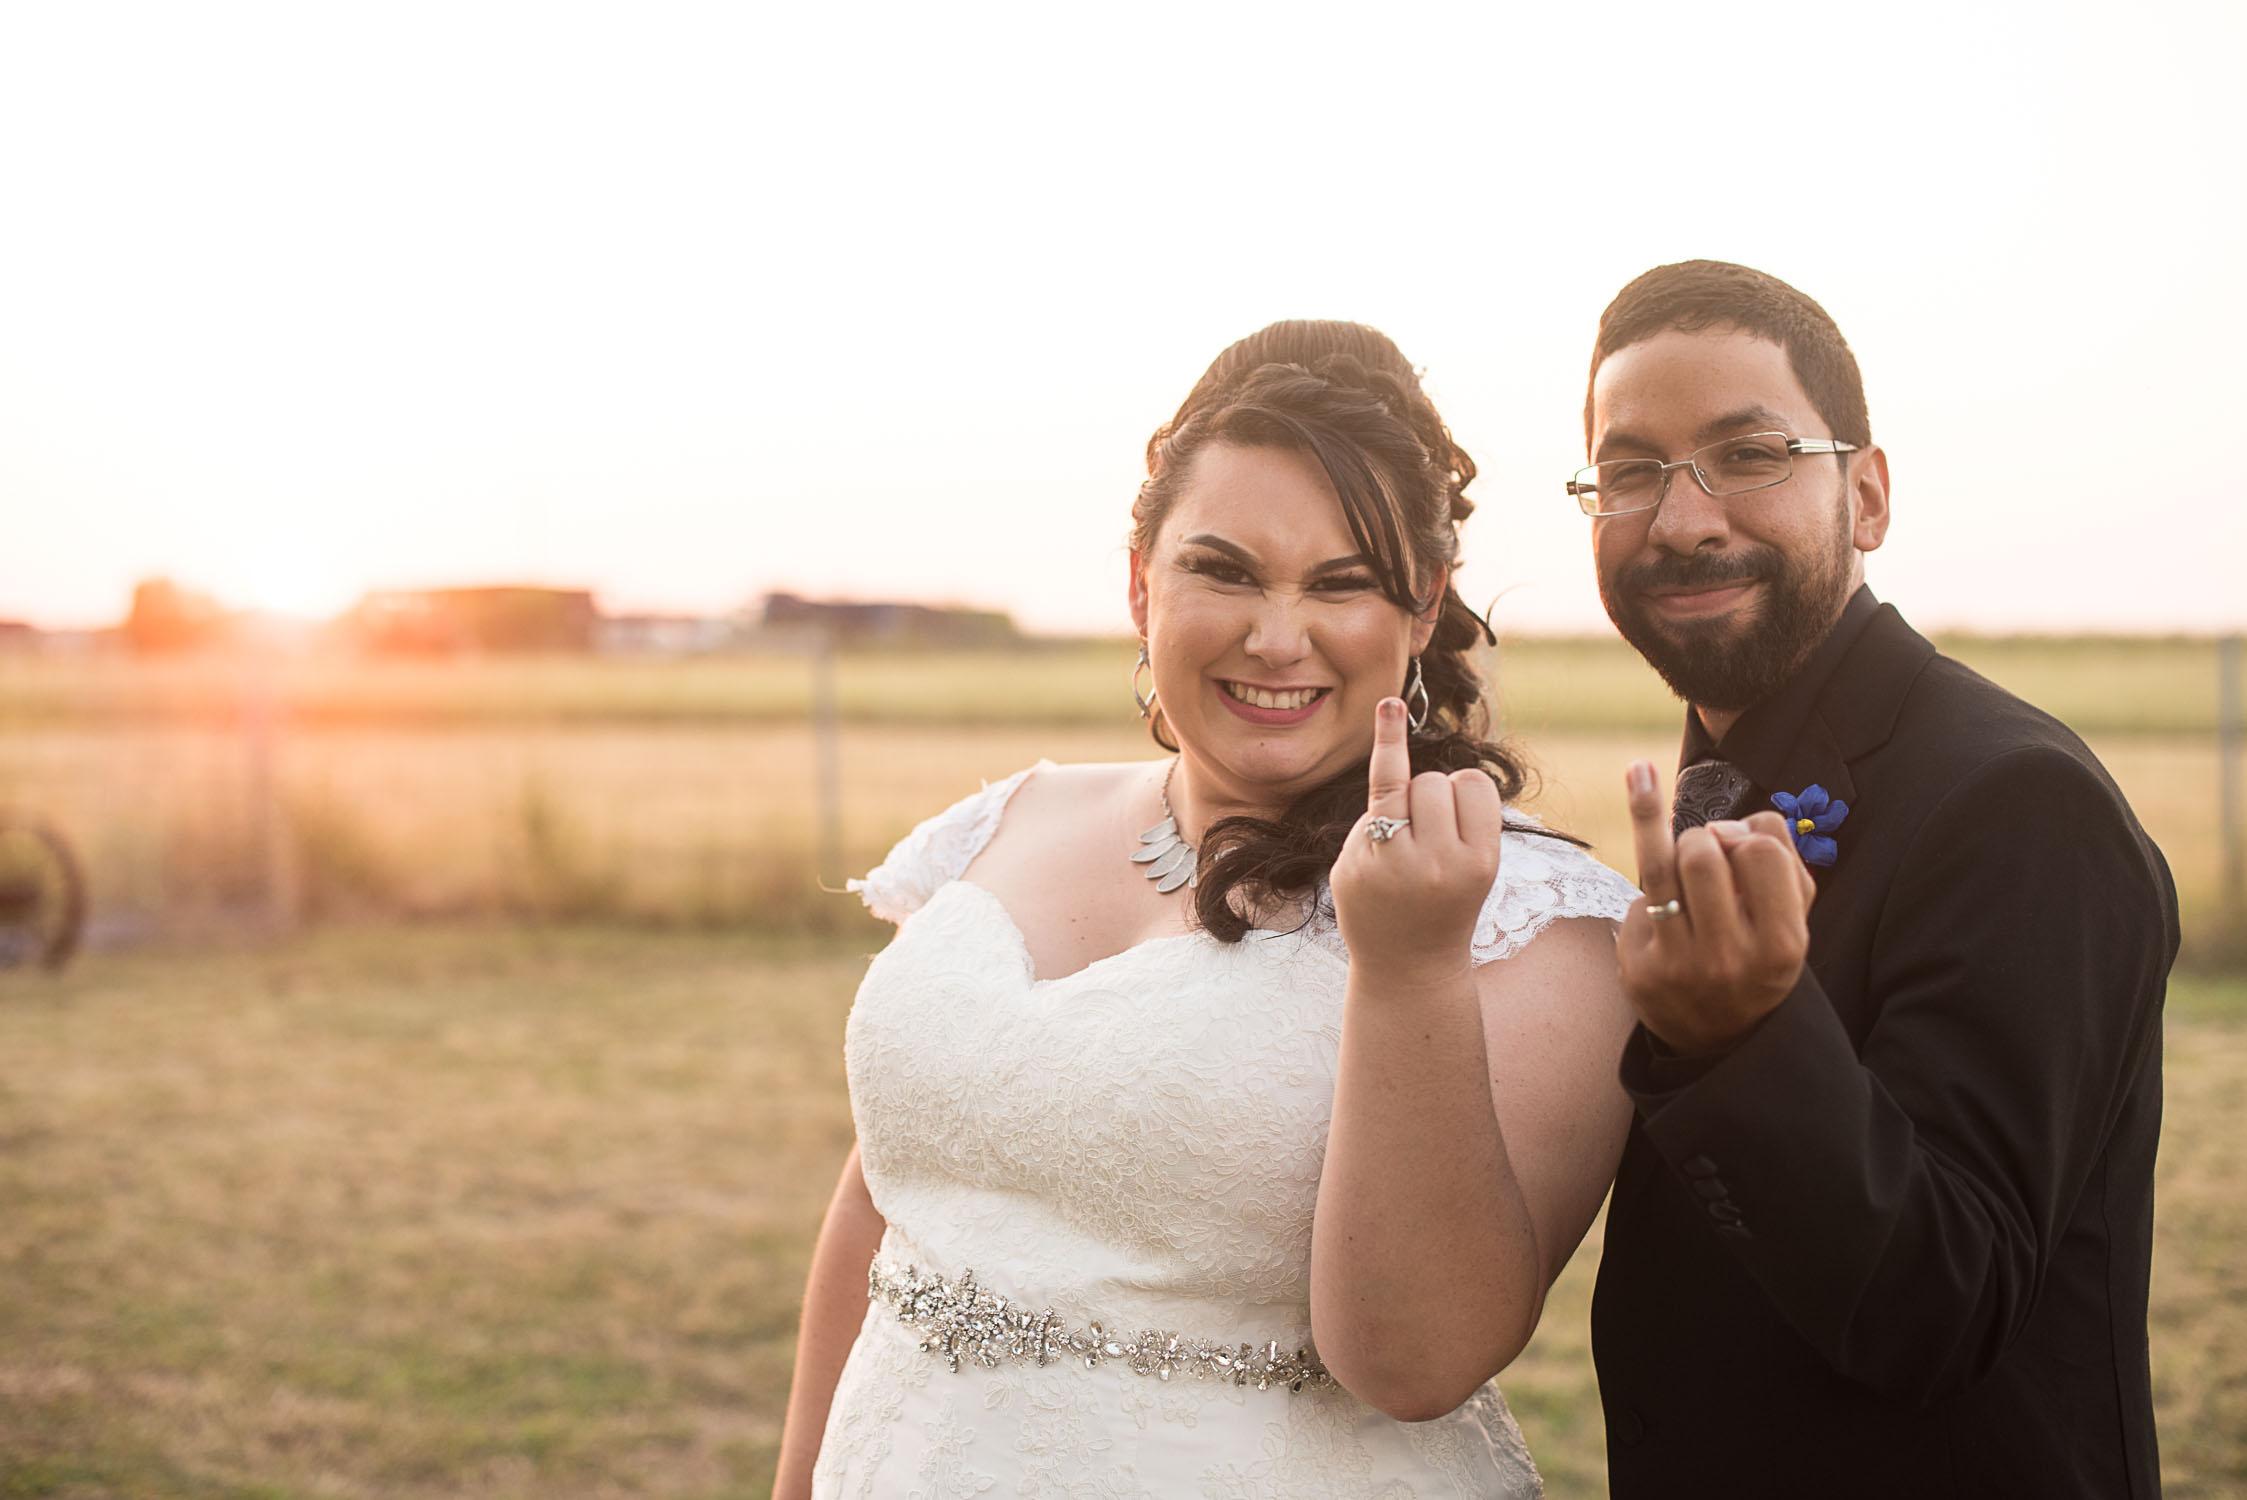 Leal Wedding Mira Visu Photography-143.jpg